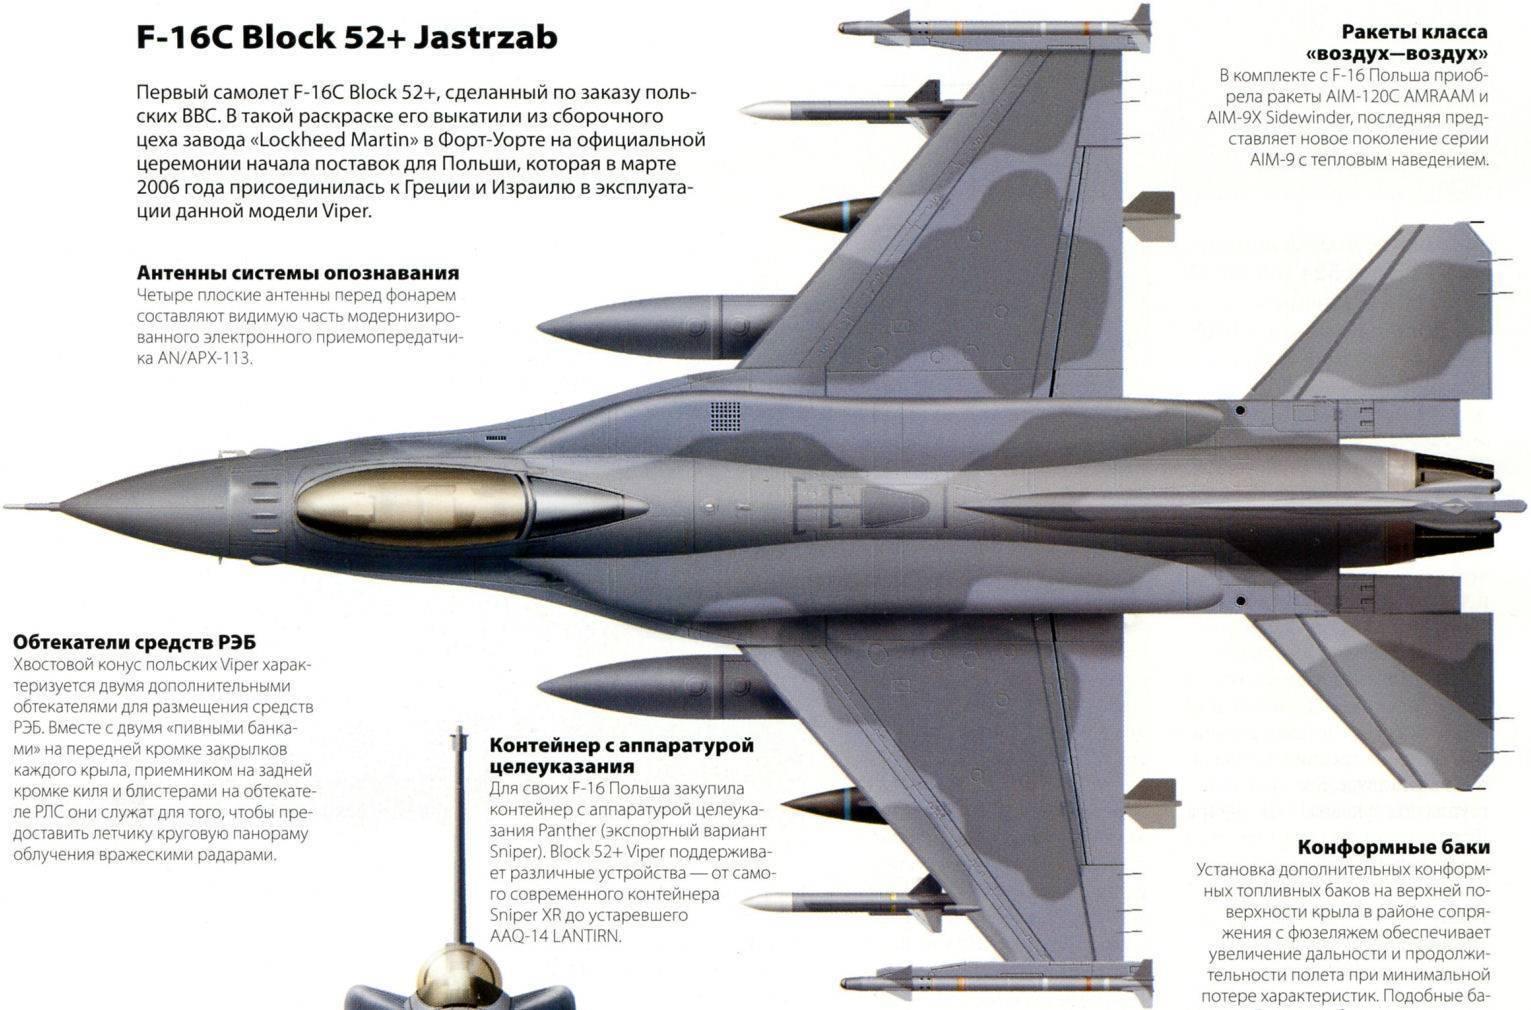 Истребитель lockheed martin f-35а lightning ii - галерея - впк.name